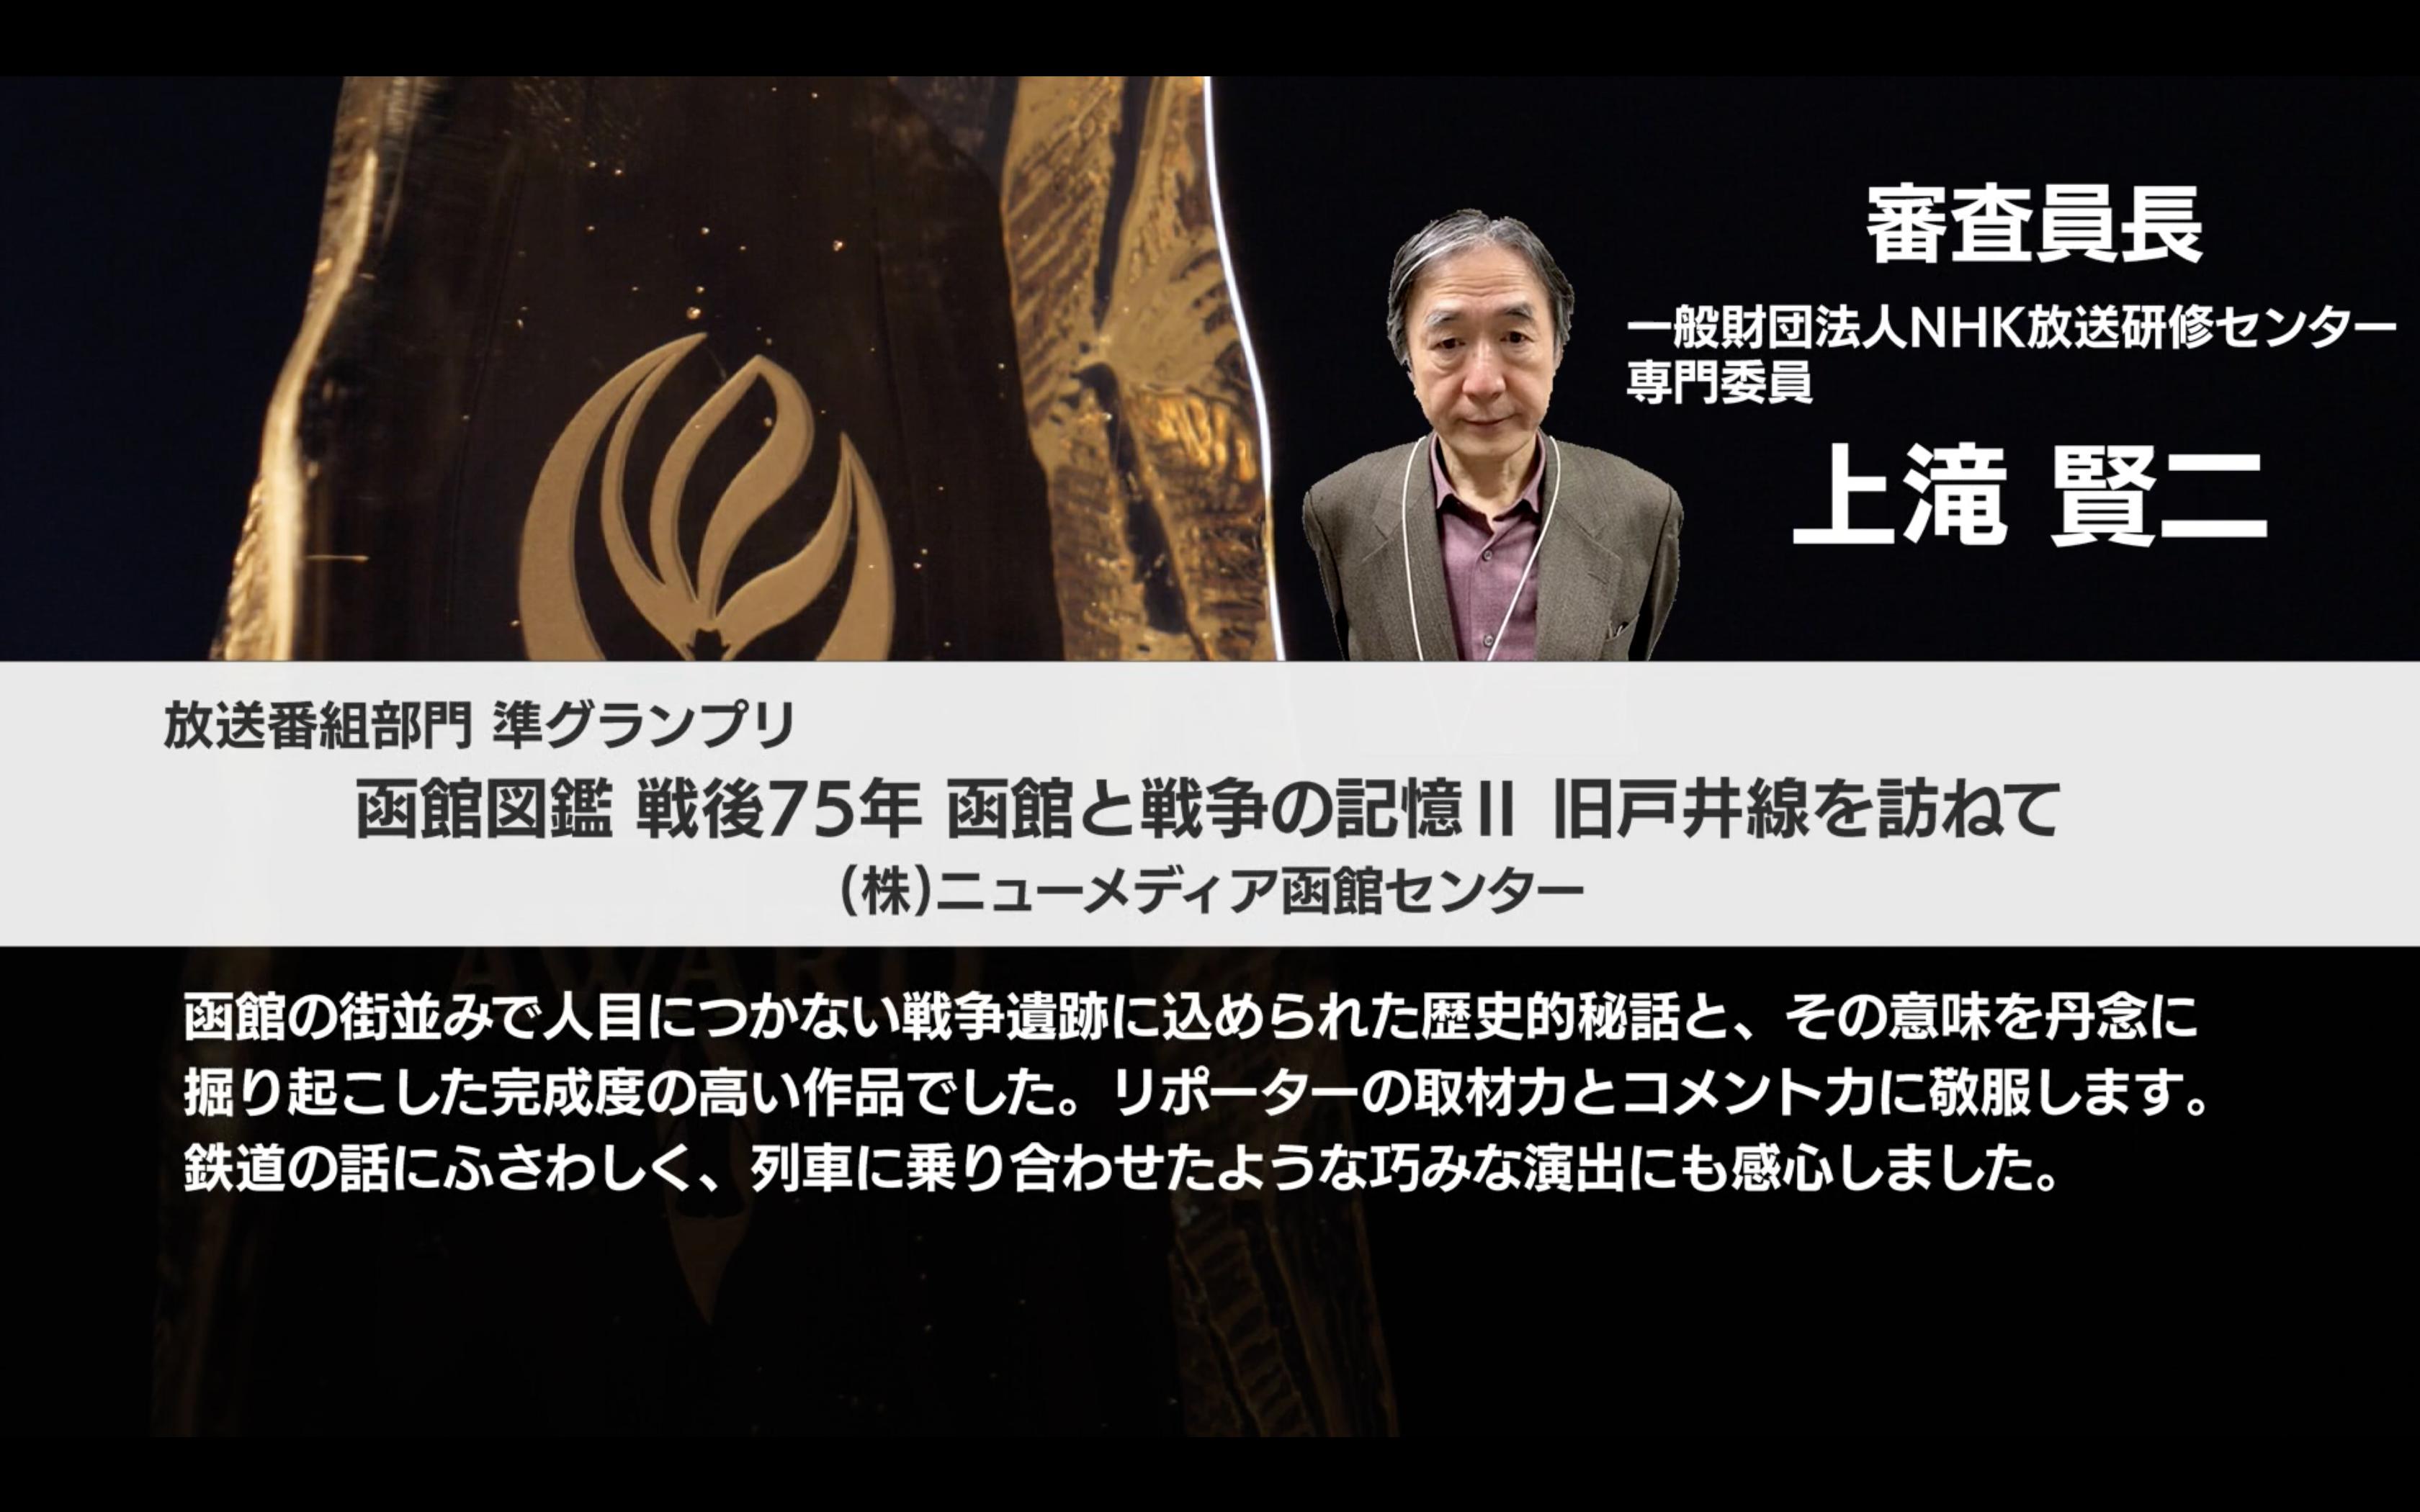 http://www.monokaki-0138.jp/hakodate/%E3%82%B9%E3%82%AF%E3%83%AA%E3%83%BC%E3%83%B3%E3%82%B7%E3%83%A7%E3%83%83%E3%83%88%202021-03-25%2016.01.23.png